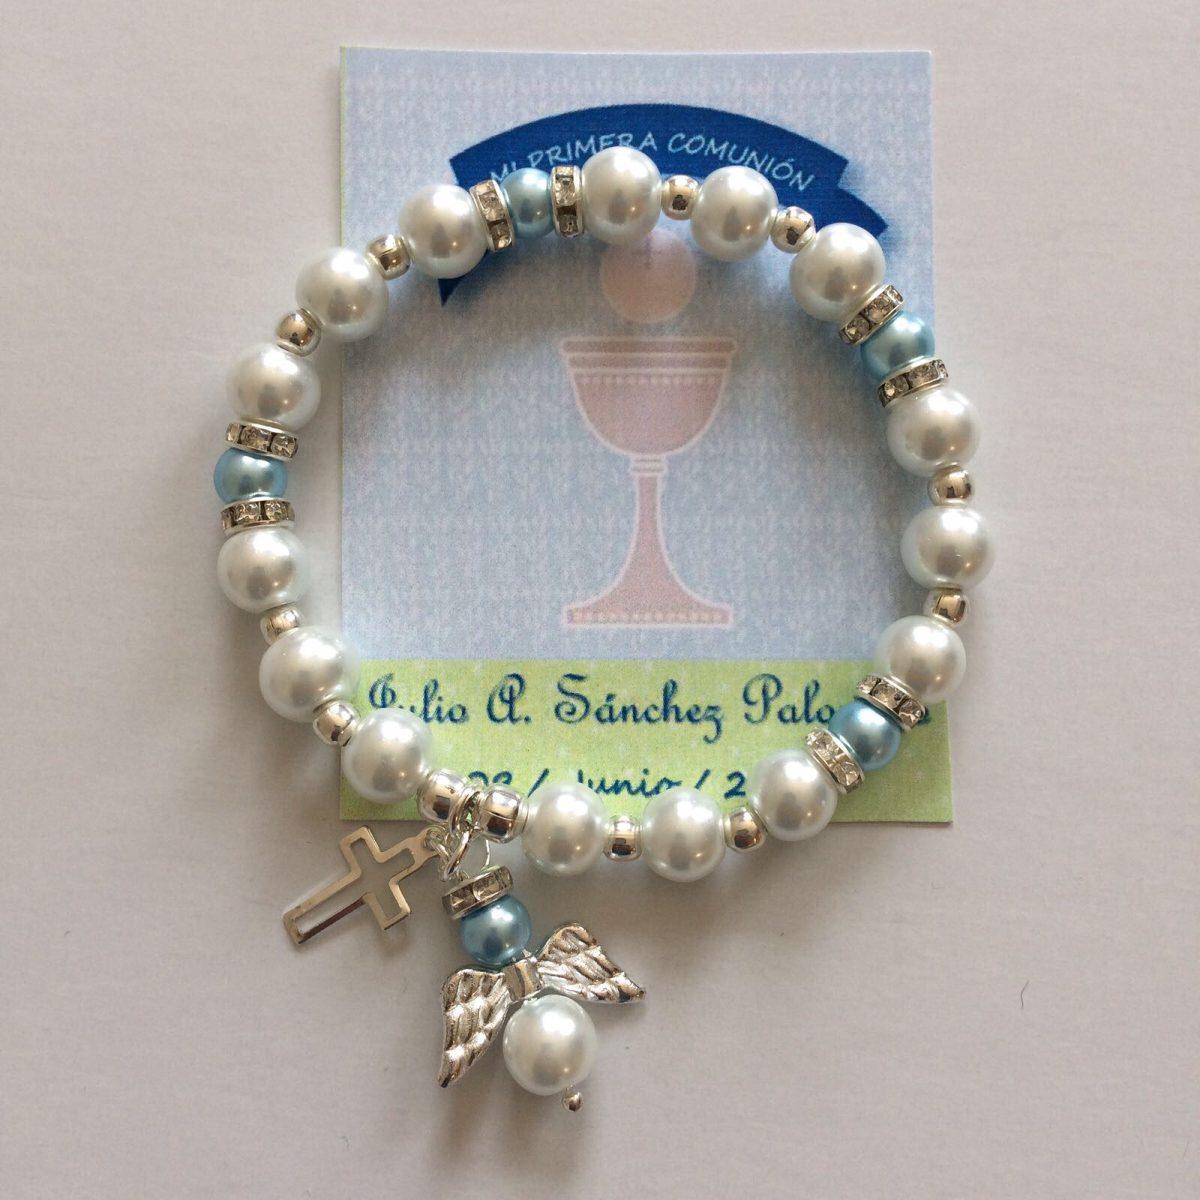 38 pulsera recuerdo bautizo confirmaci n comuni n ni o for Recuerdos para bautizo nino